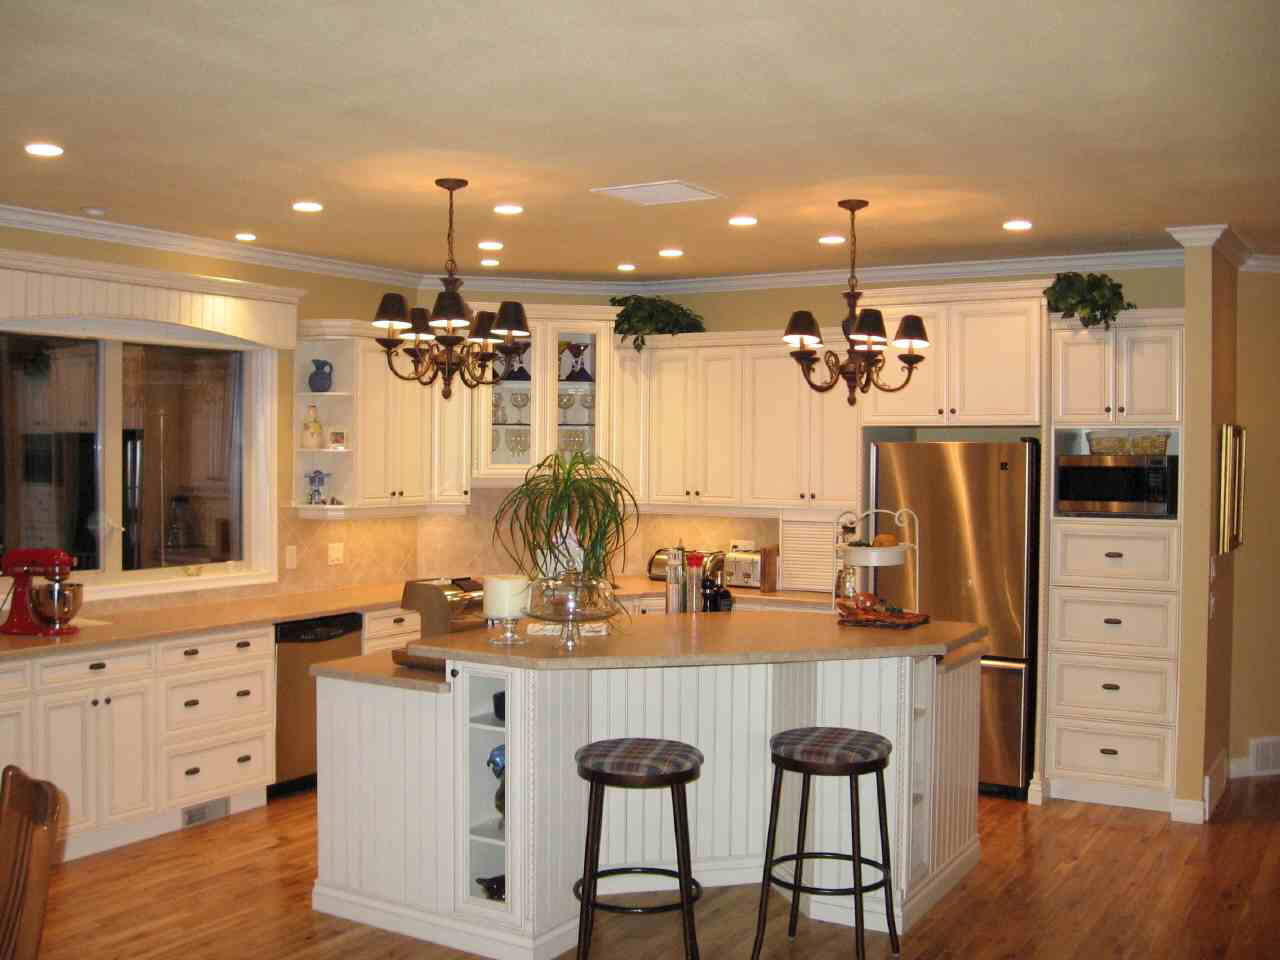 Inexpensive kitchen islands photo - 2